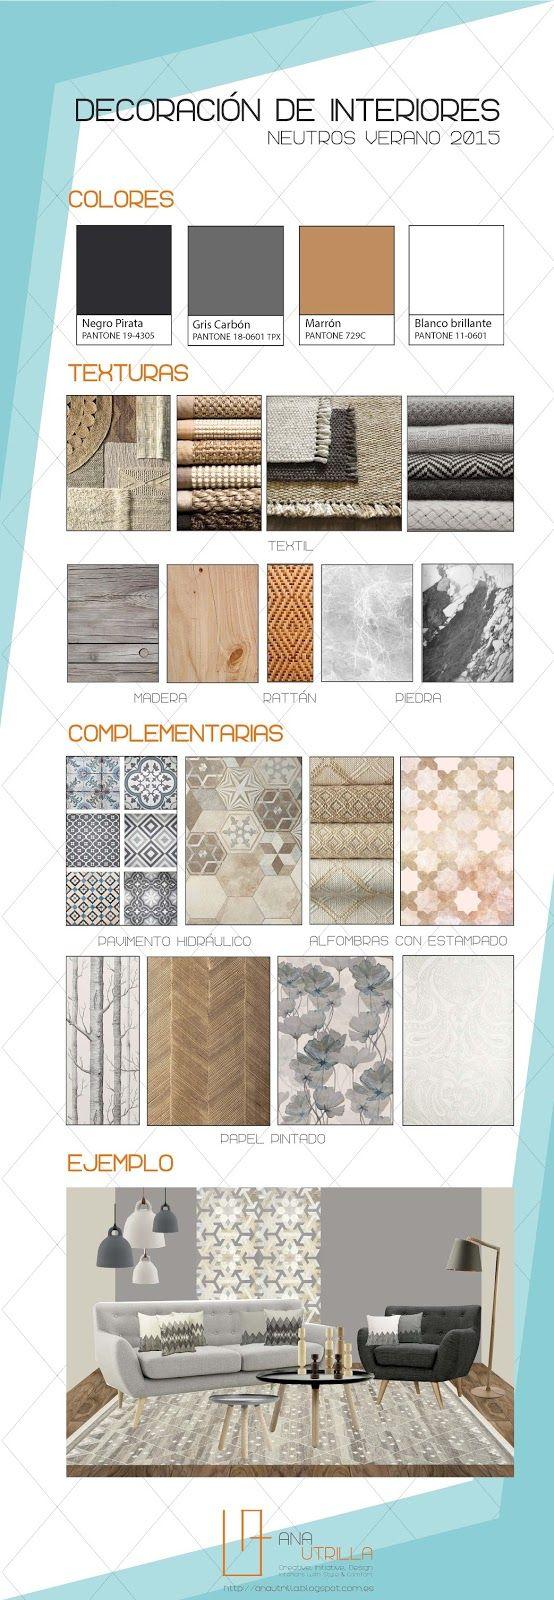 #Infografías #Cómo #decorar interiores con colores y texturas neutras, por Ana Utrilla Info@anautrilla.com